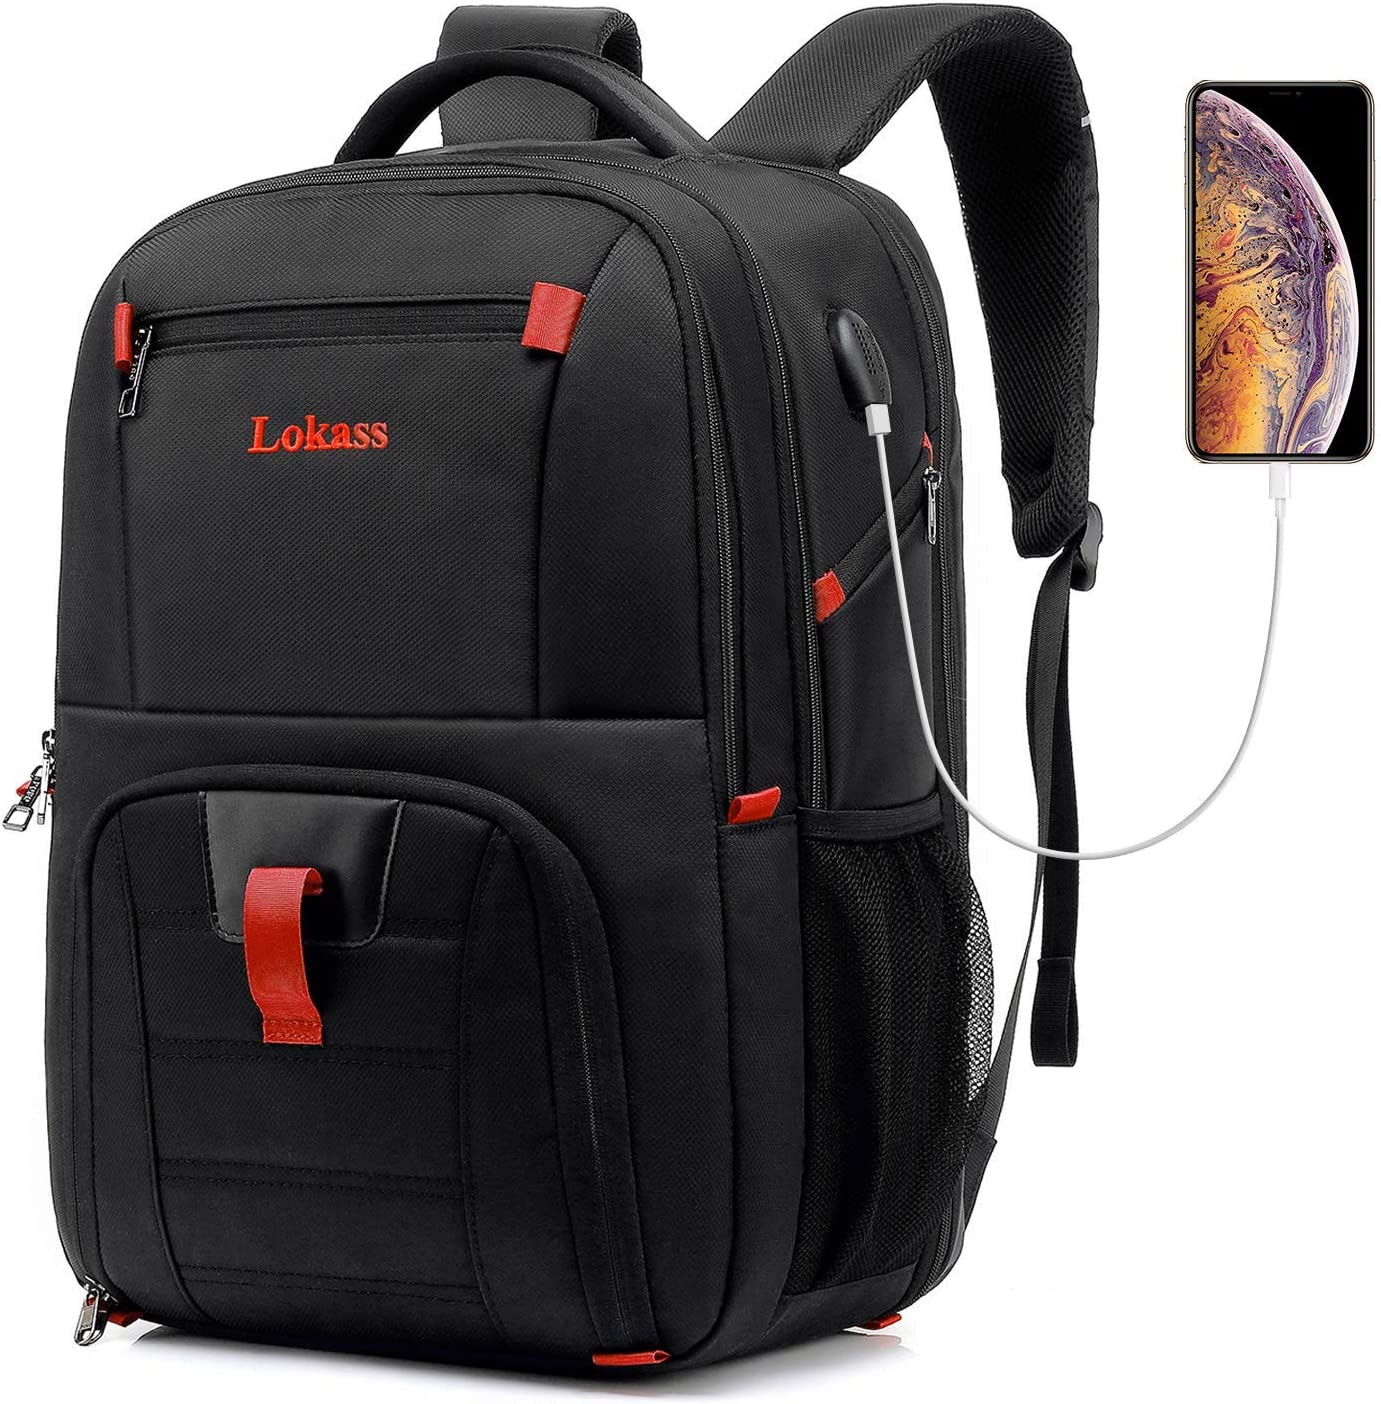 "17/"" Laptop Computer Backpack Travel Business College Bag USB Charging Port Gray"